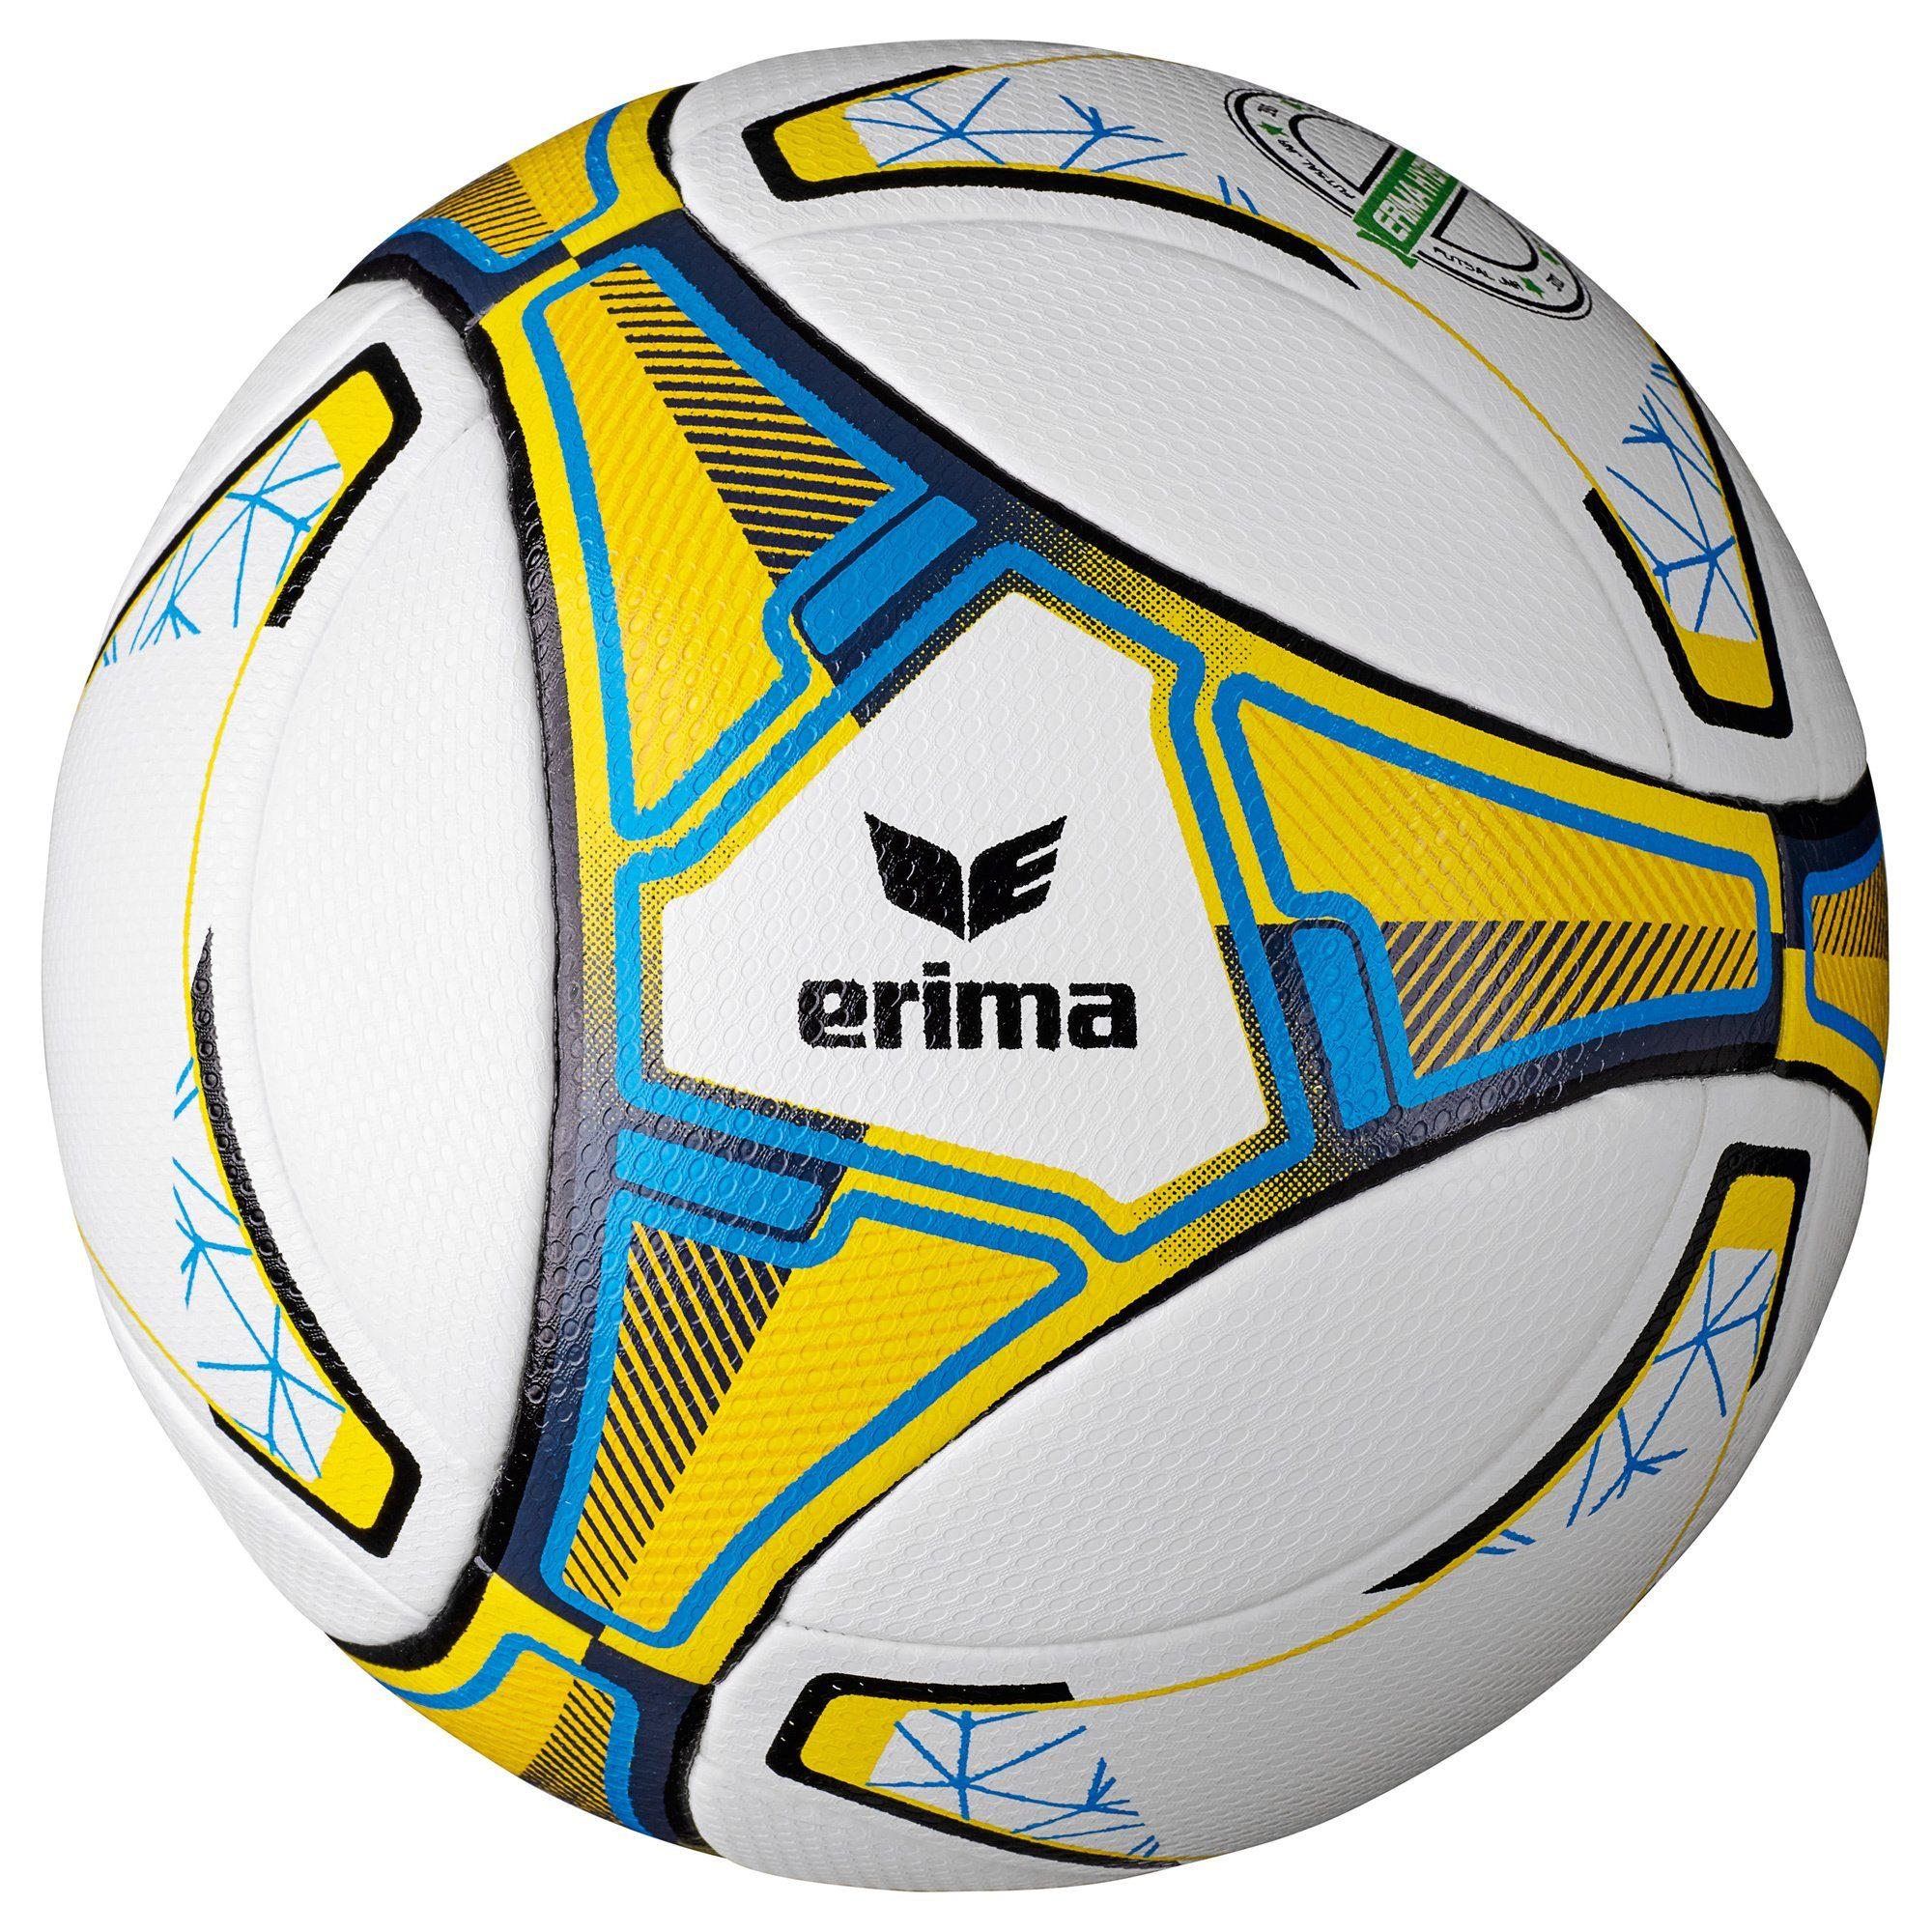 ERIMA Hybrid Futsal Junior 310 Matchball